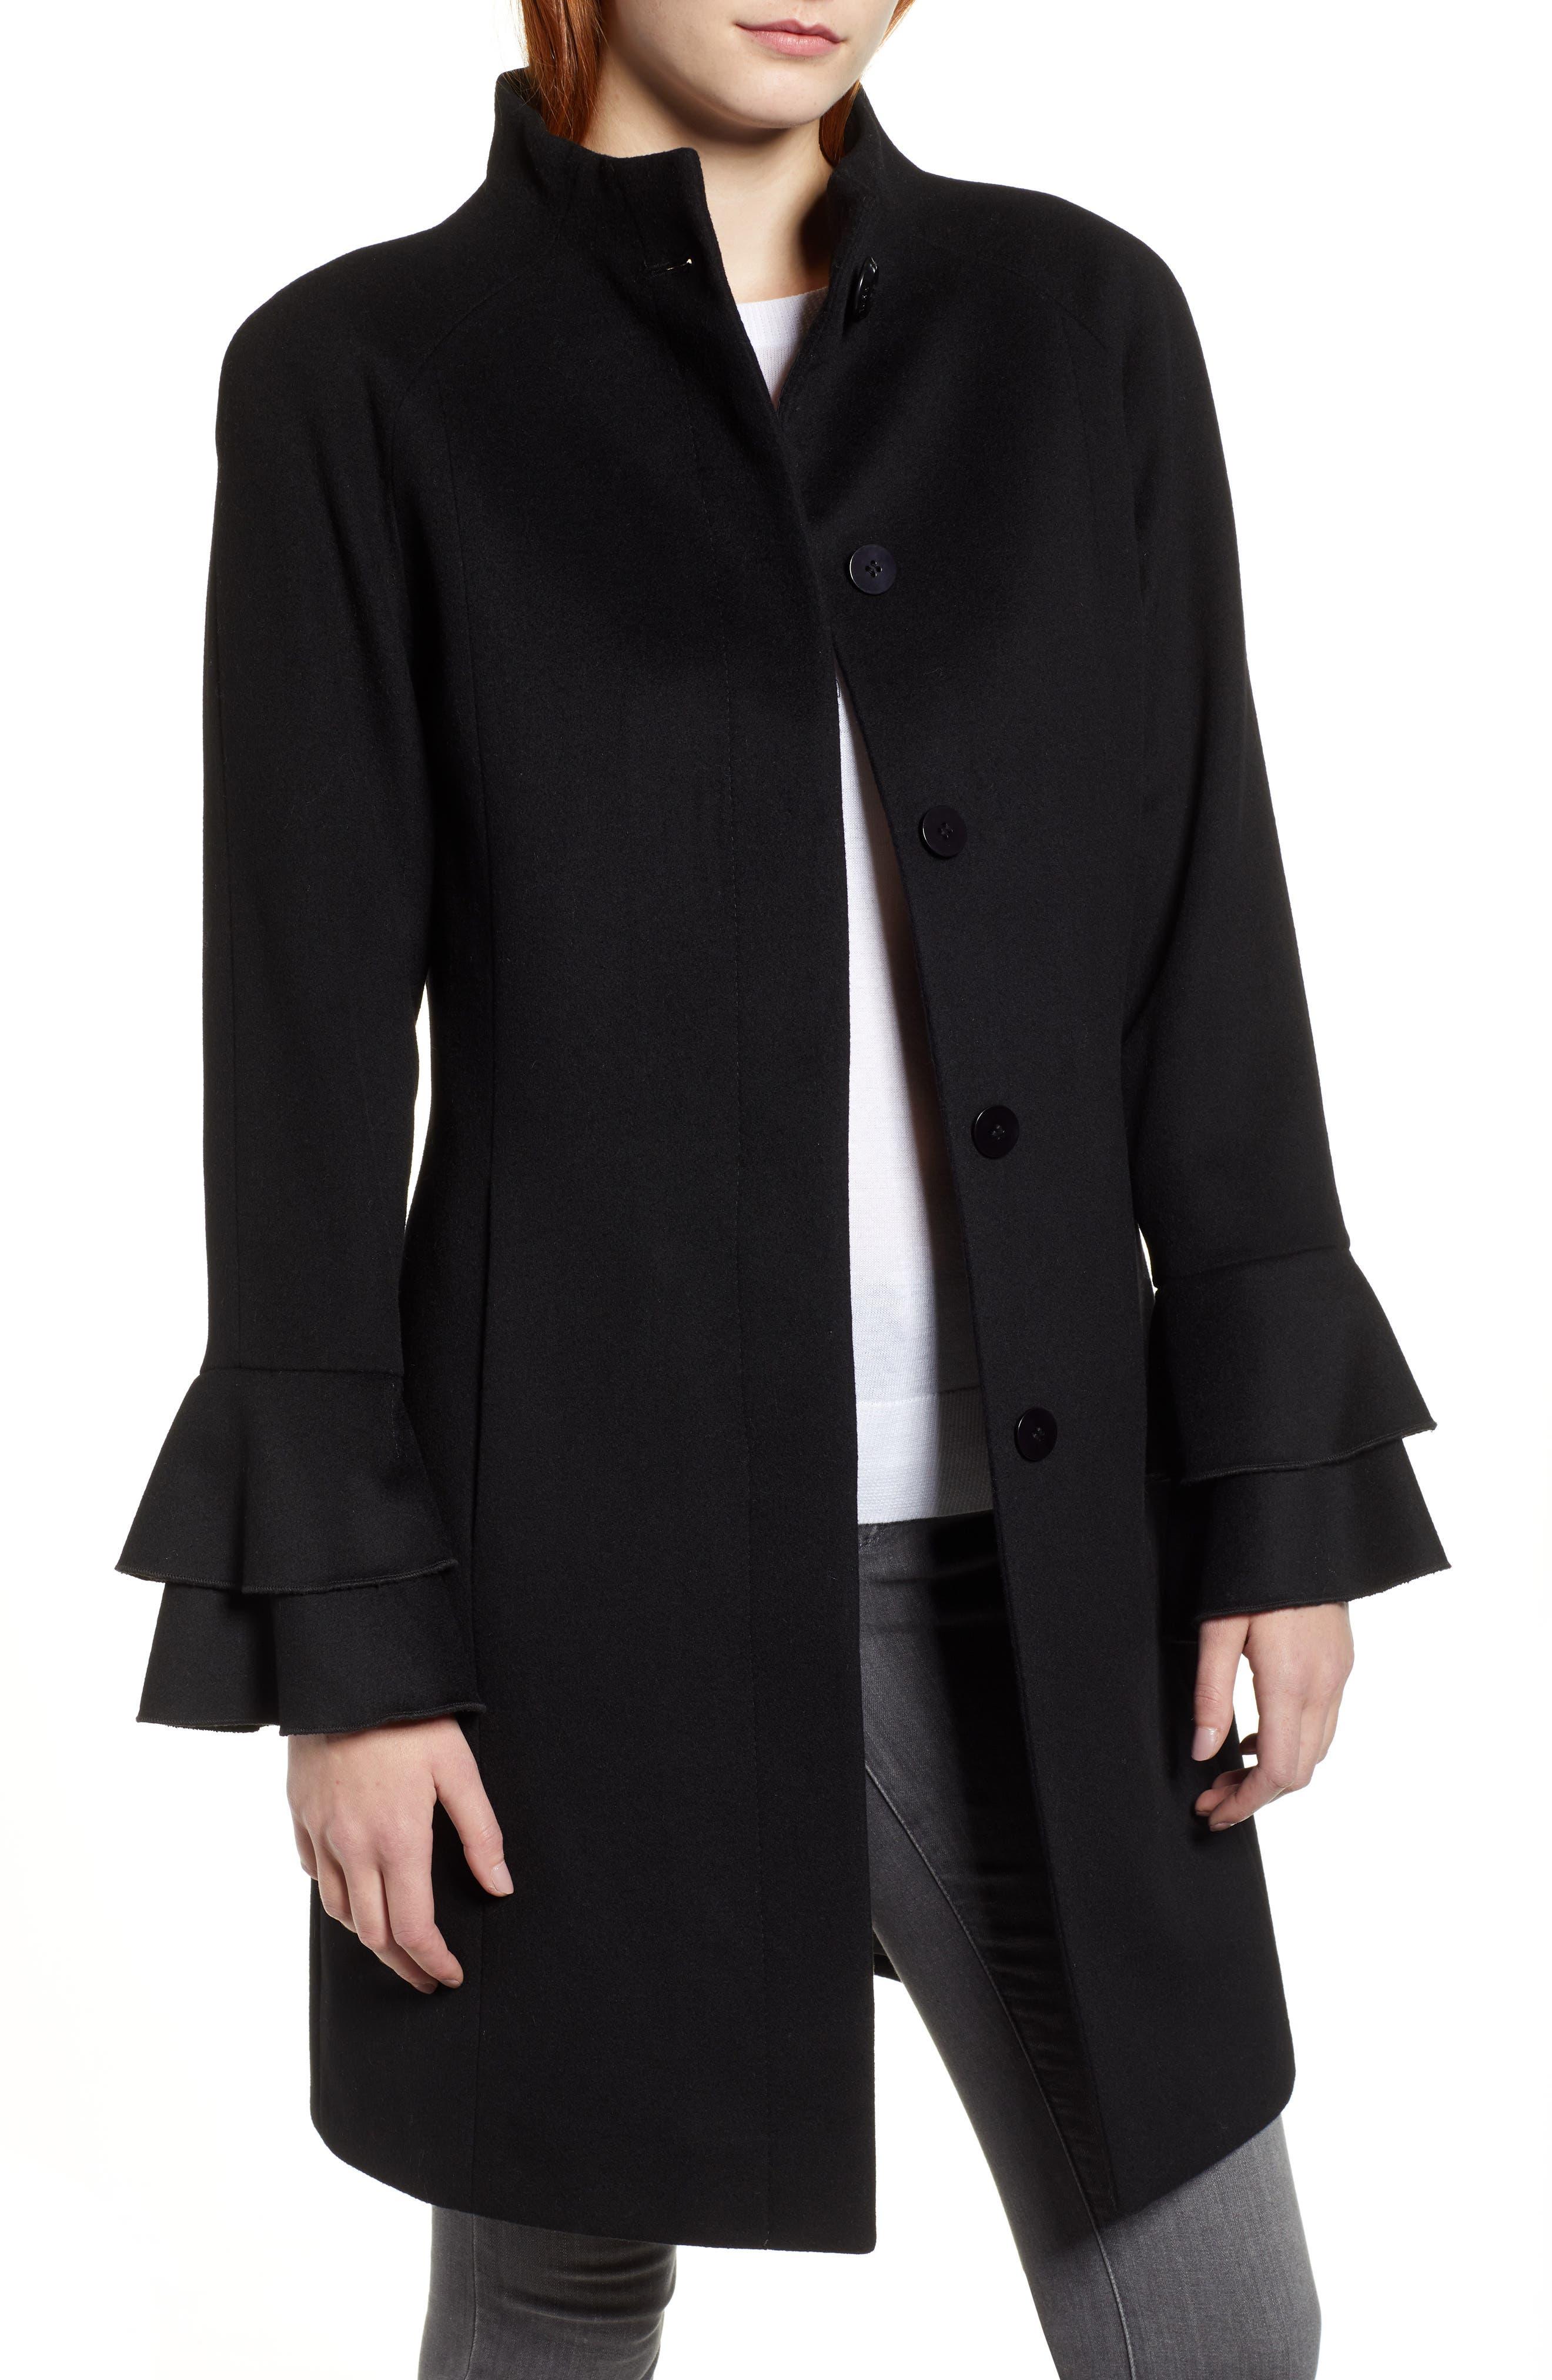 TRINA TURK Sara Ruffle Cuff Wool Blend Coat, Main, color, 001